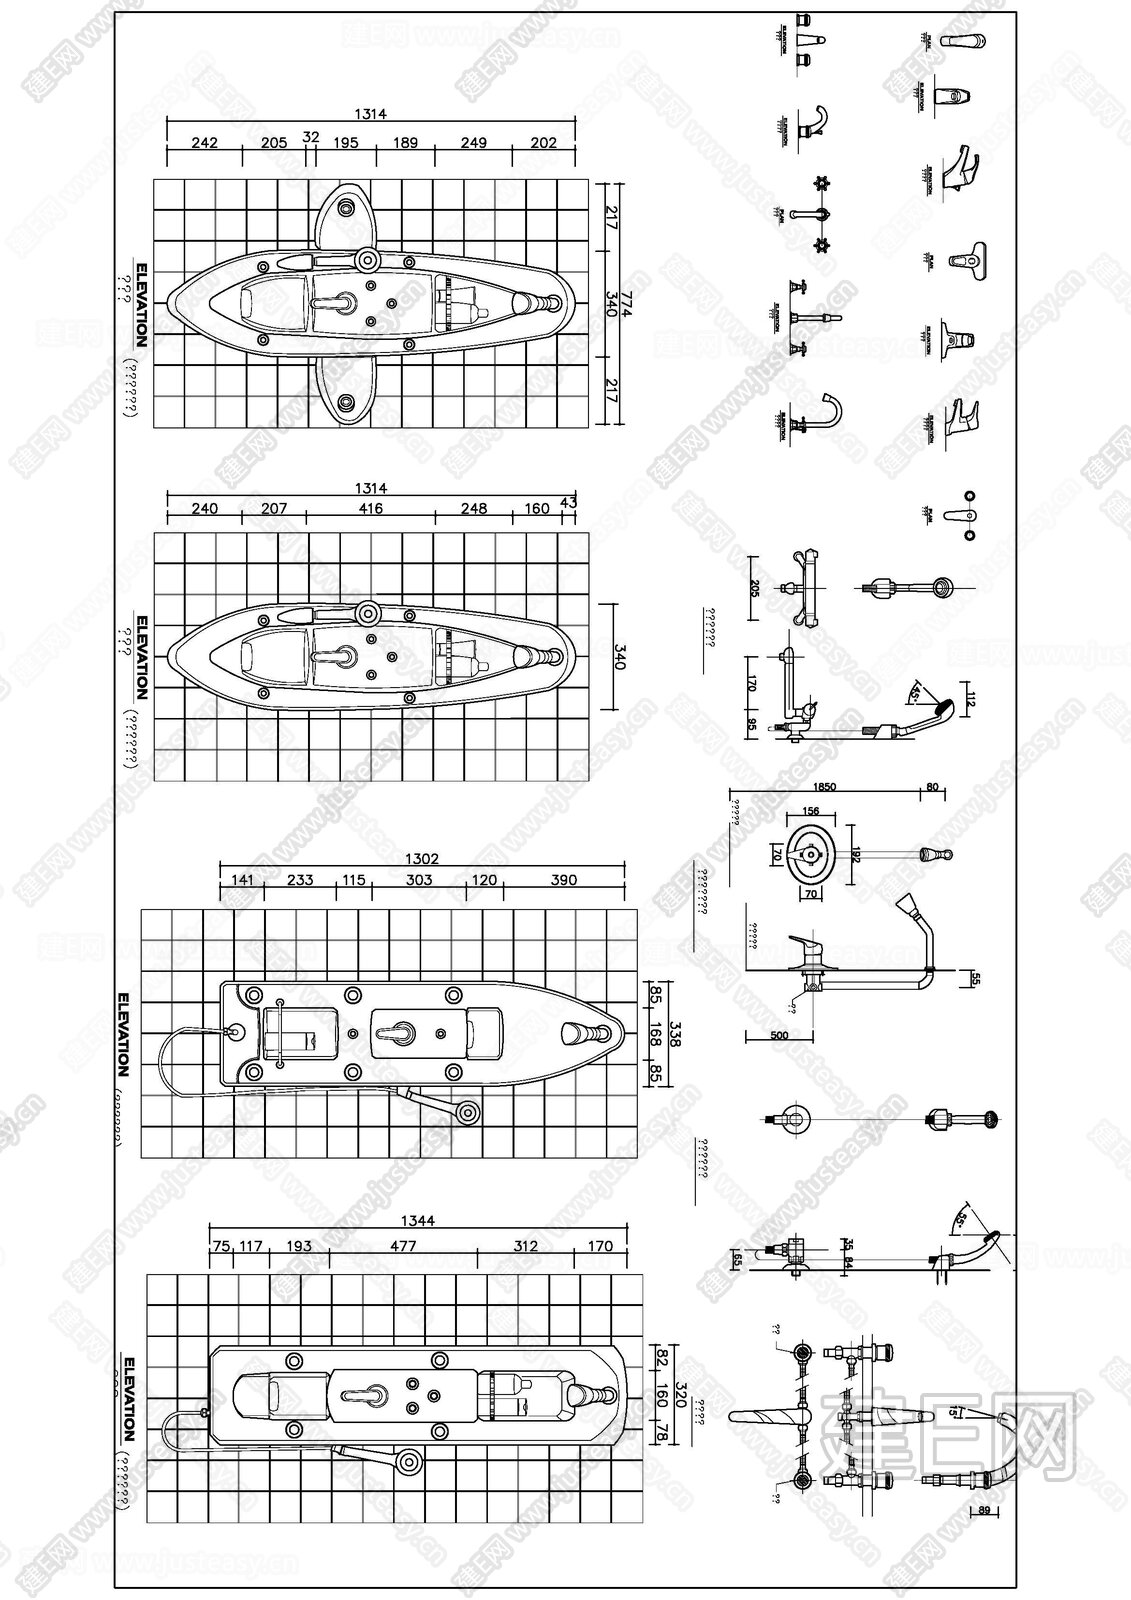 厨卫 |CAD图块